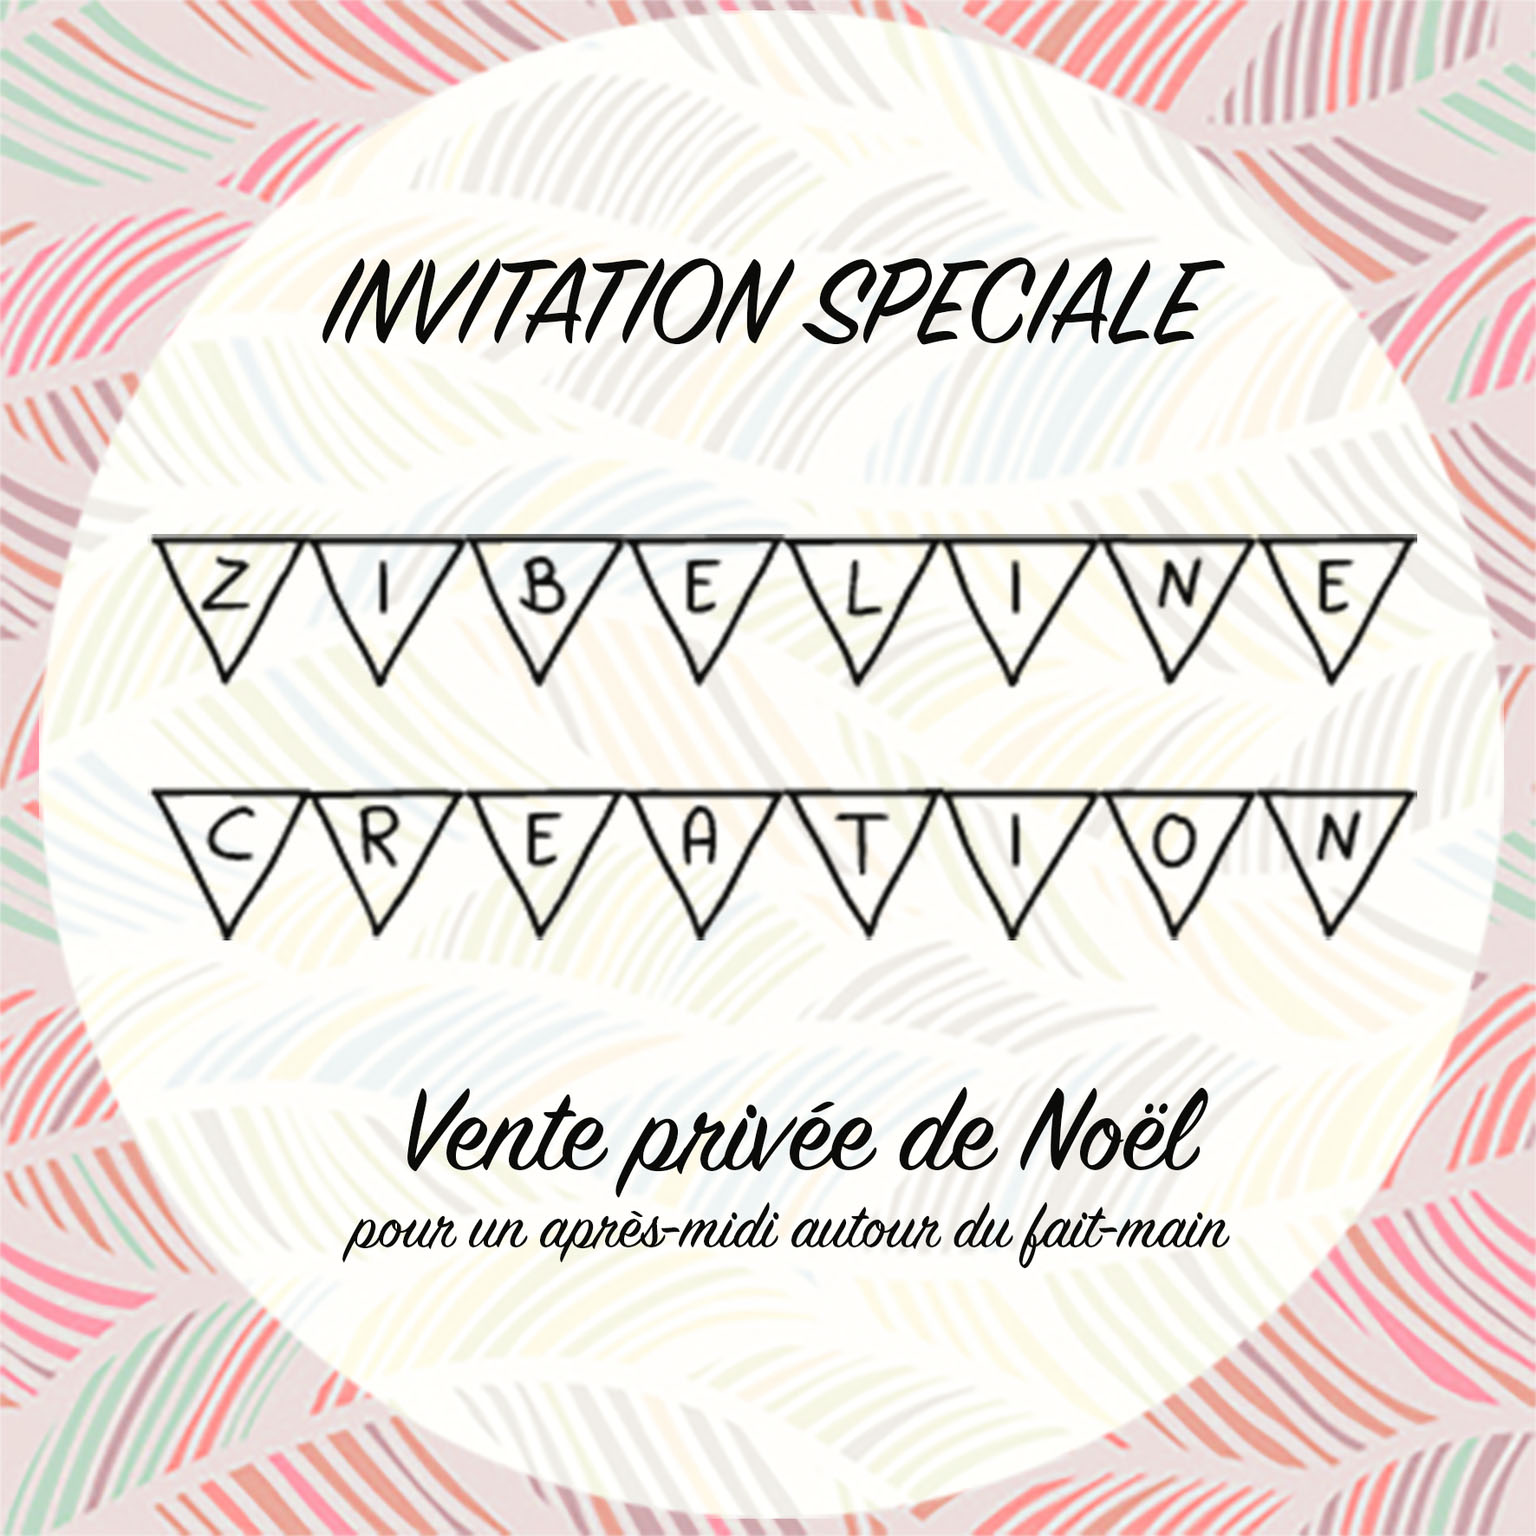 carte invitation vente privée noel Zibeline création